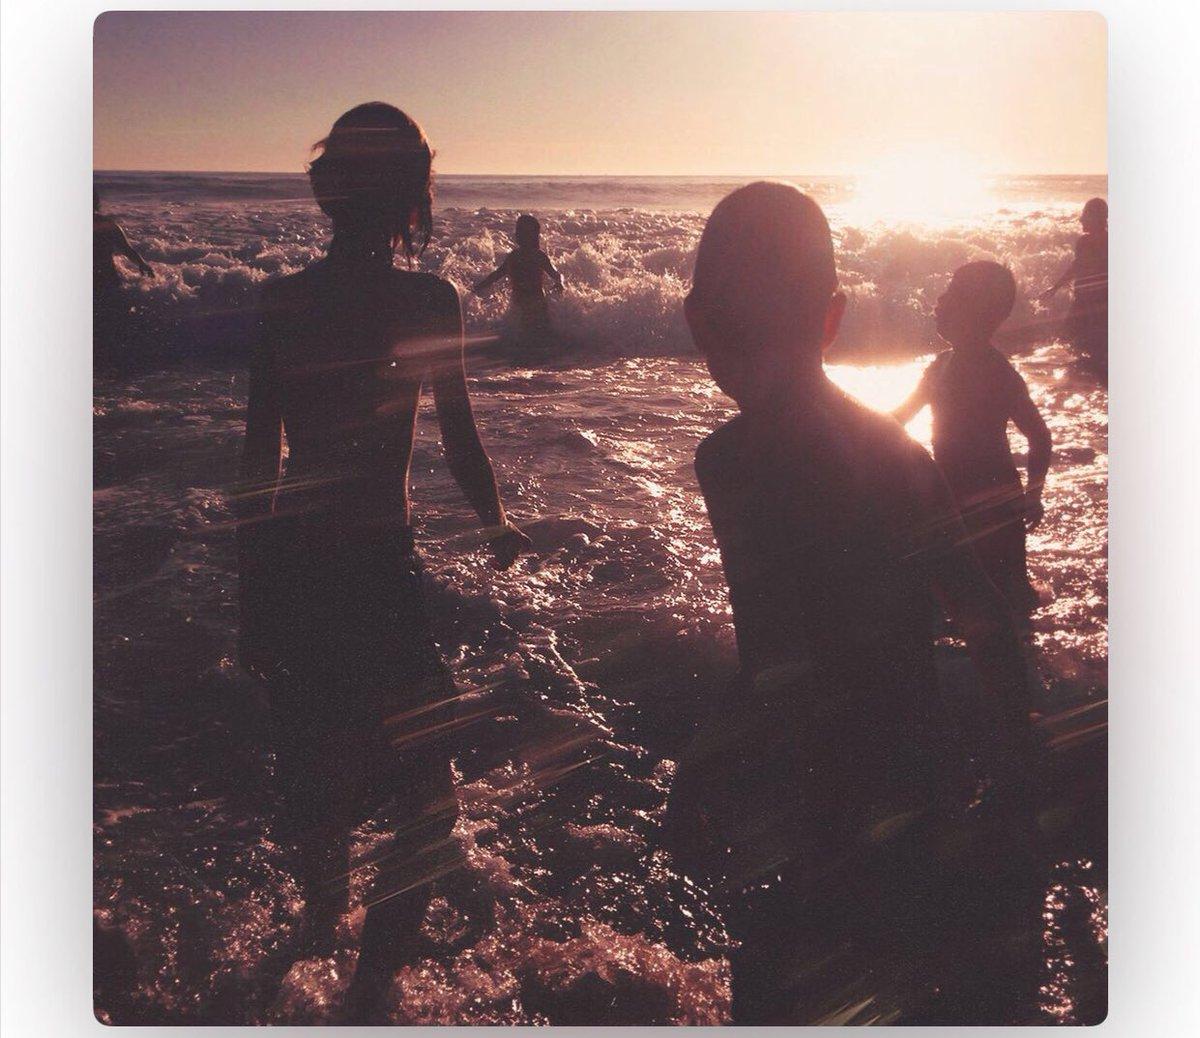 "Finally Linkin Park final album""one more light"" RIP Chester Bennington 💔! https://t.co/bZ7wzwL2st"